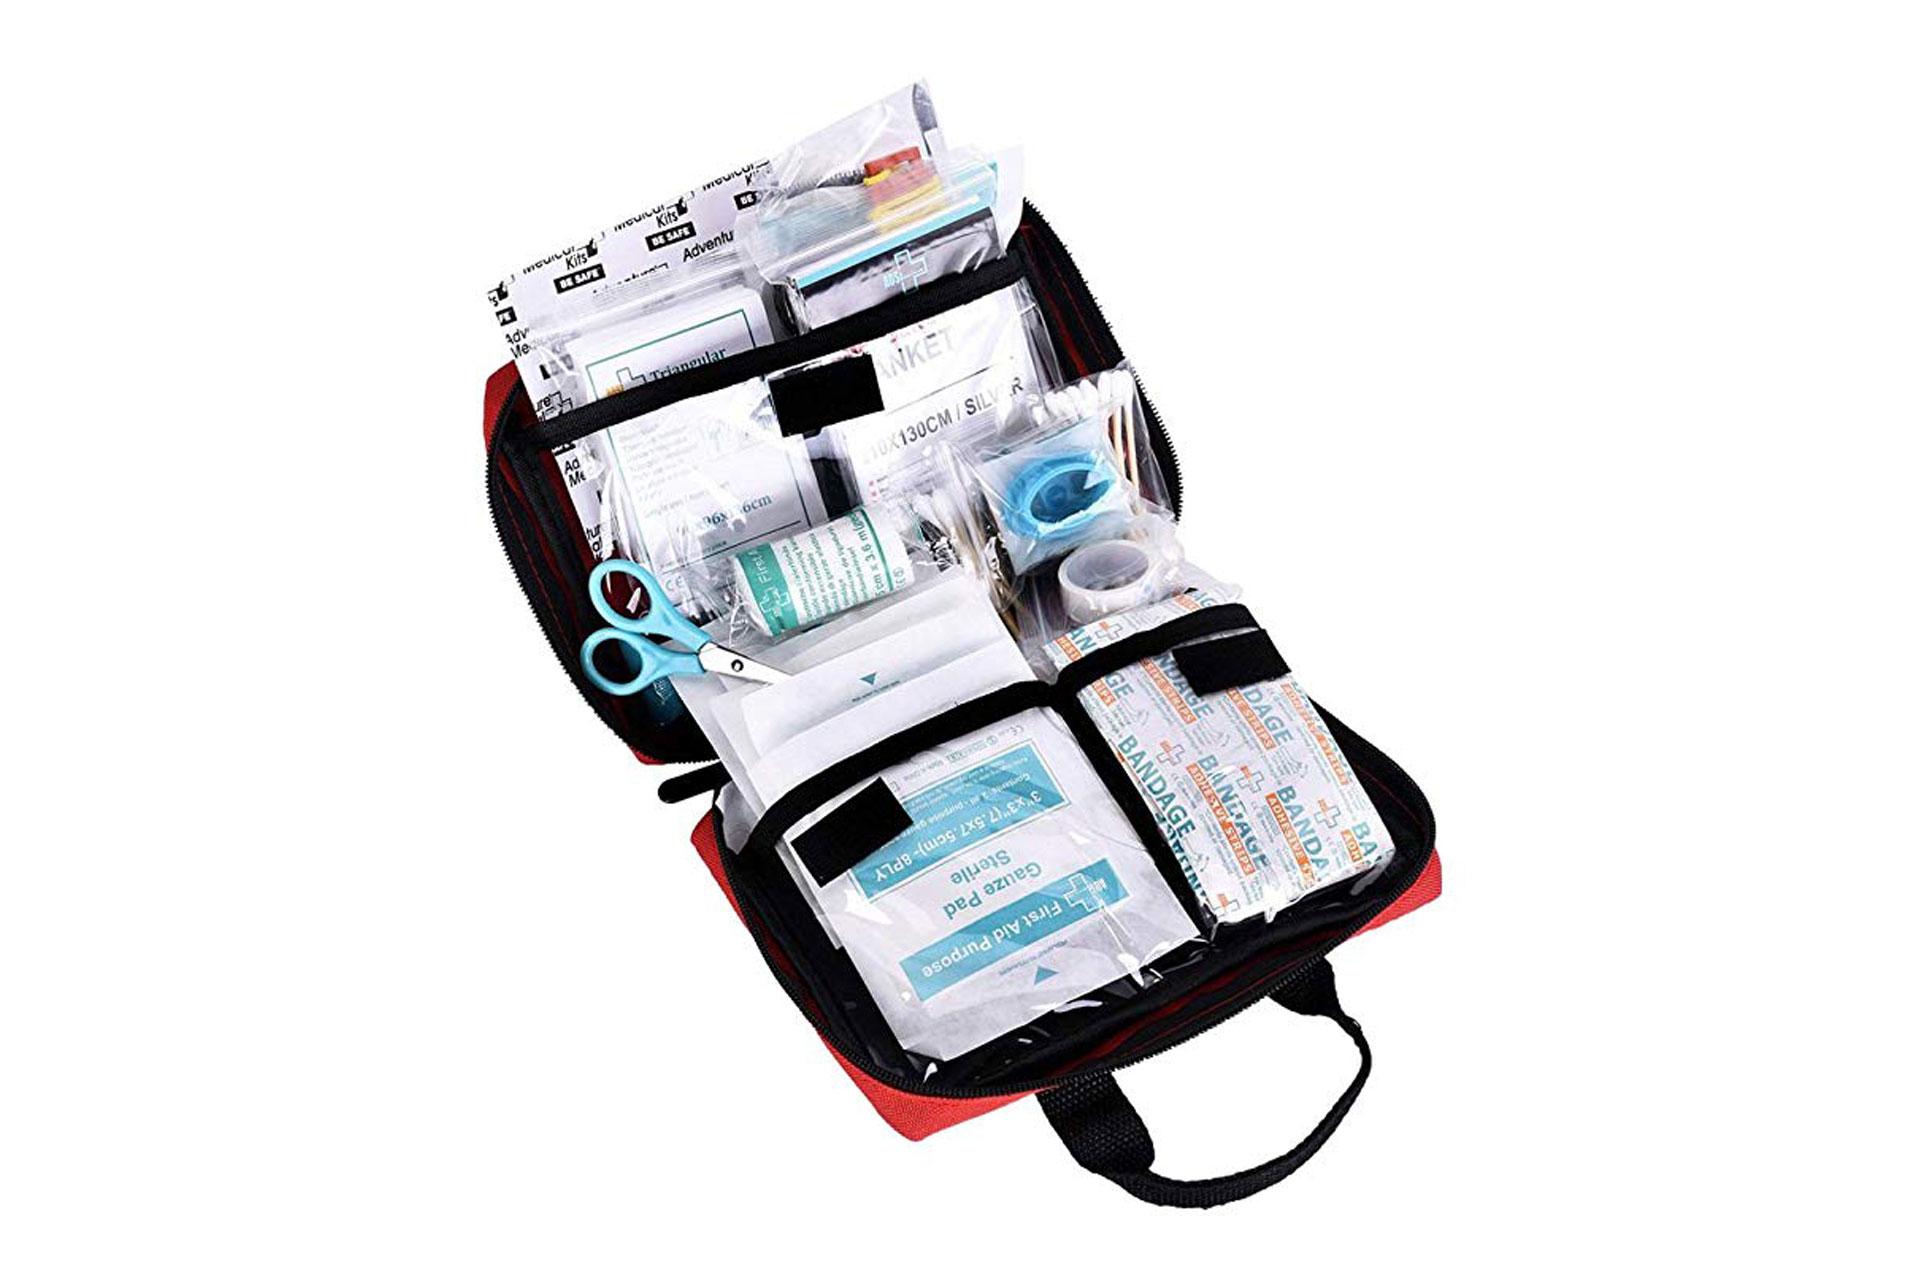 First Aid Kit; Courtesy of Amazon